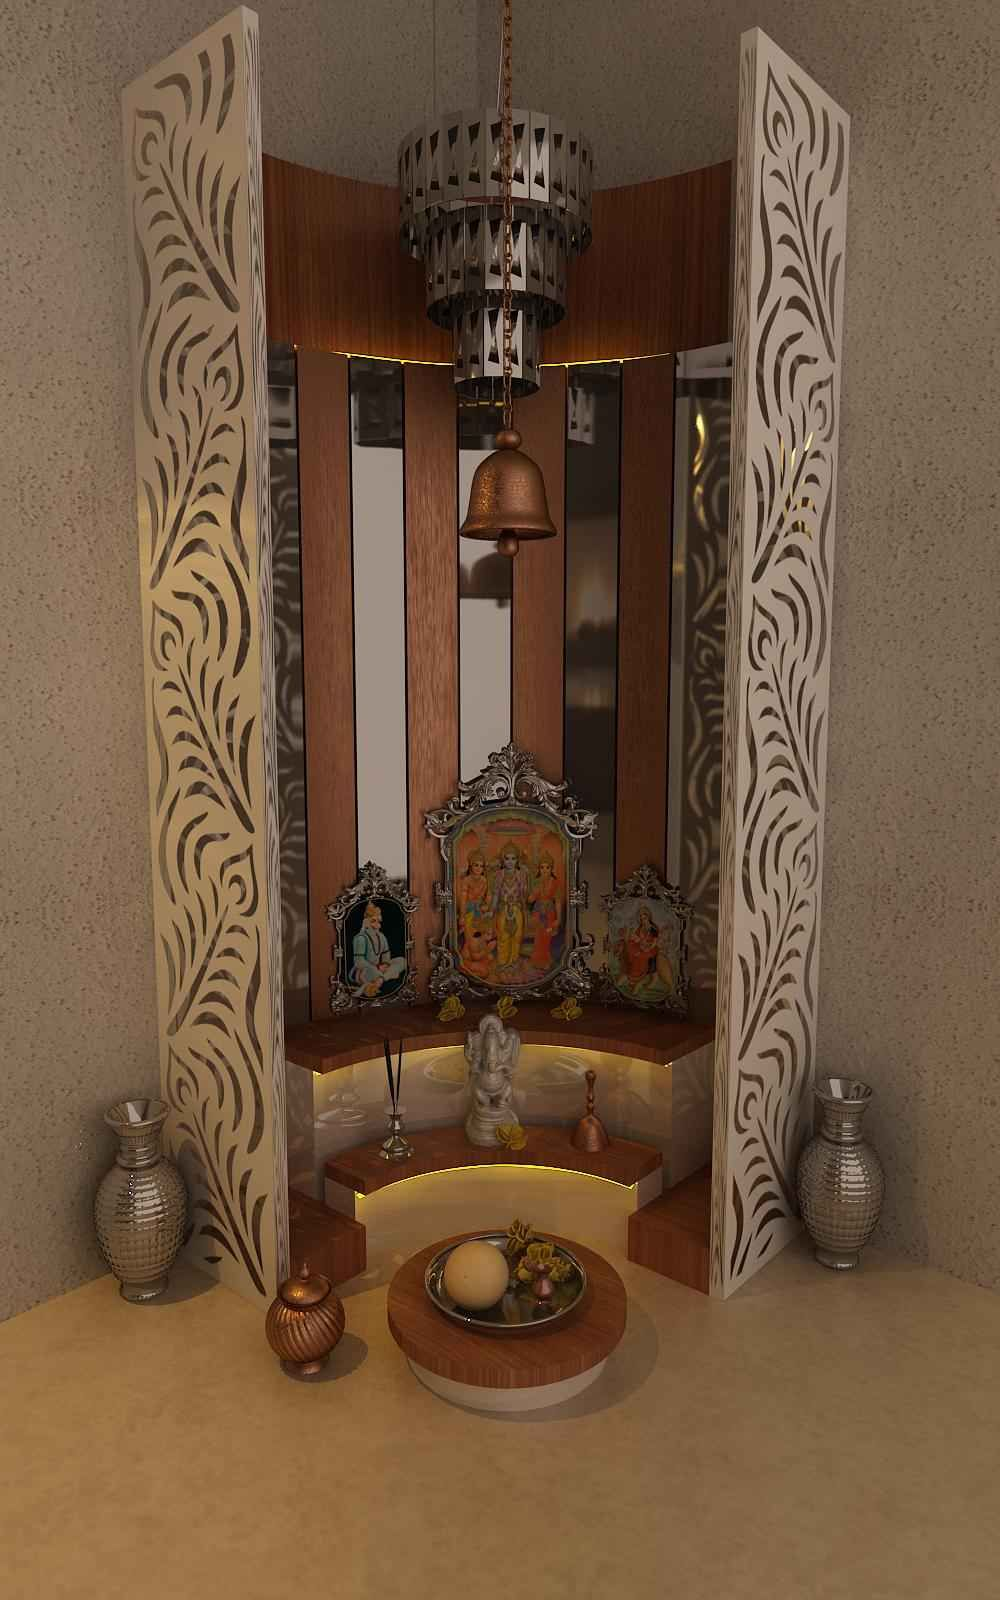 Pooja Room Designs For Flats: Pooja Room Design, Temple Design For Home